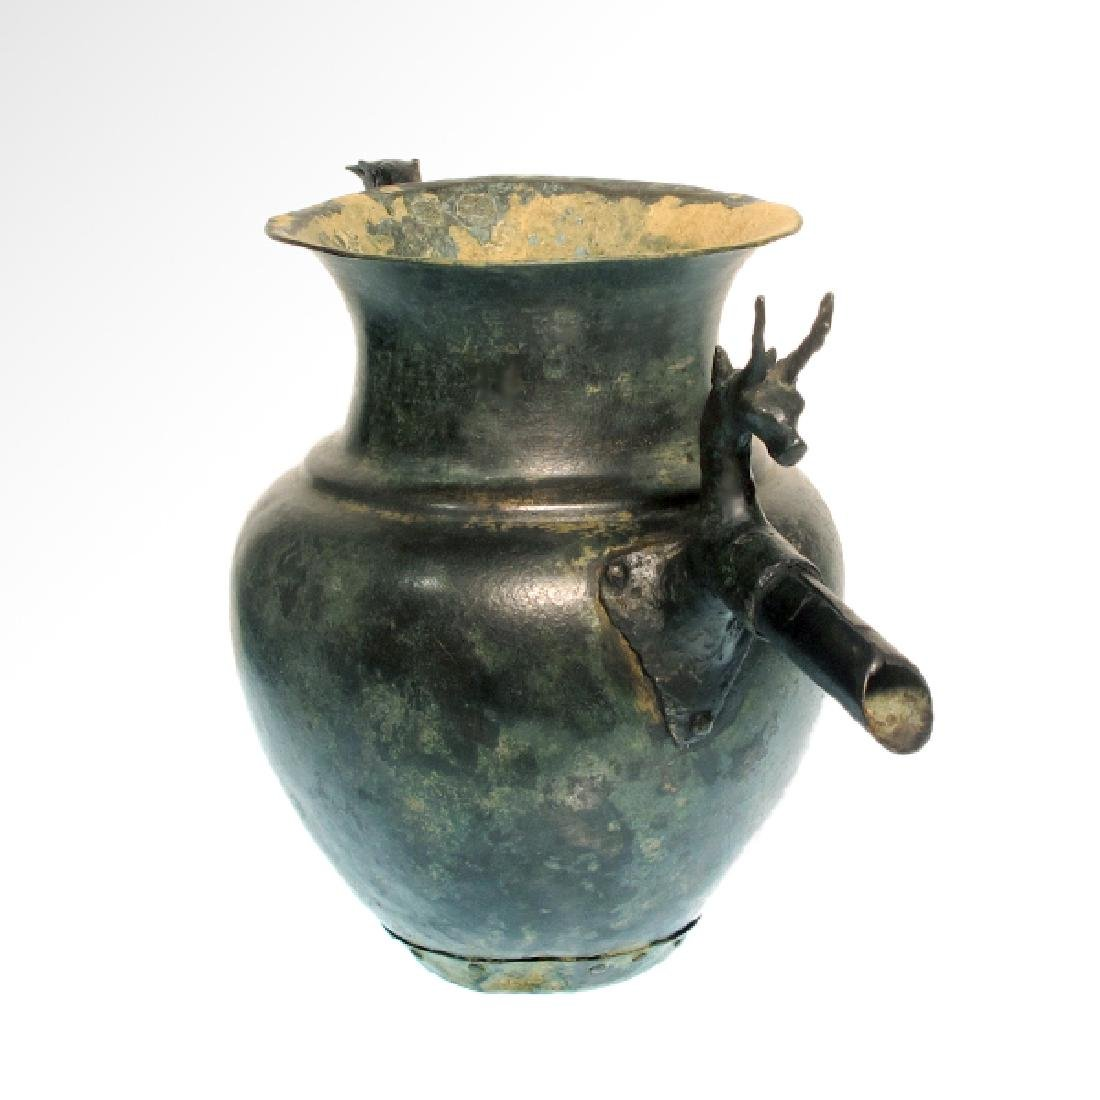 Luristan Bronze Jug with Stags, c. 900 B.C. - 3